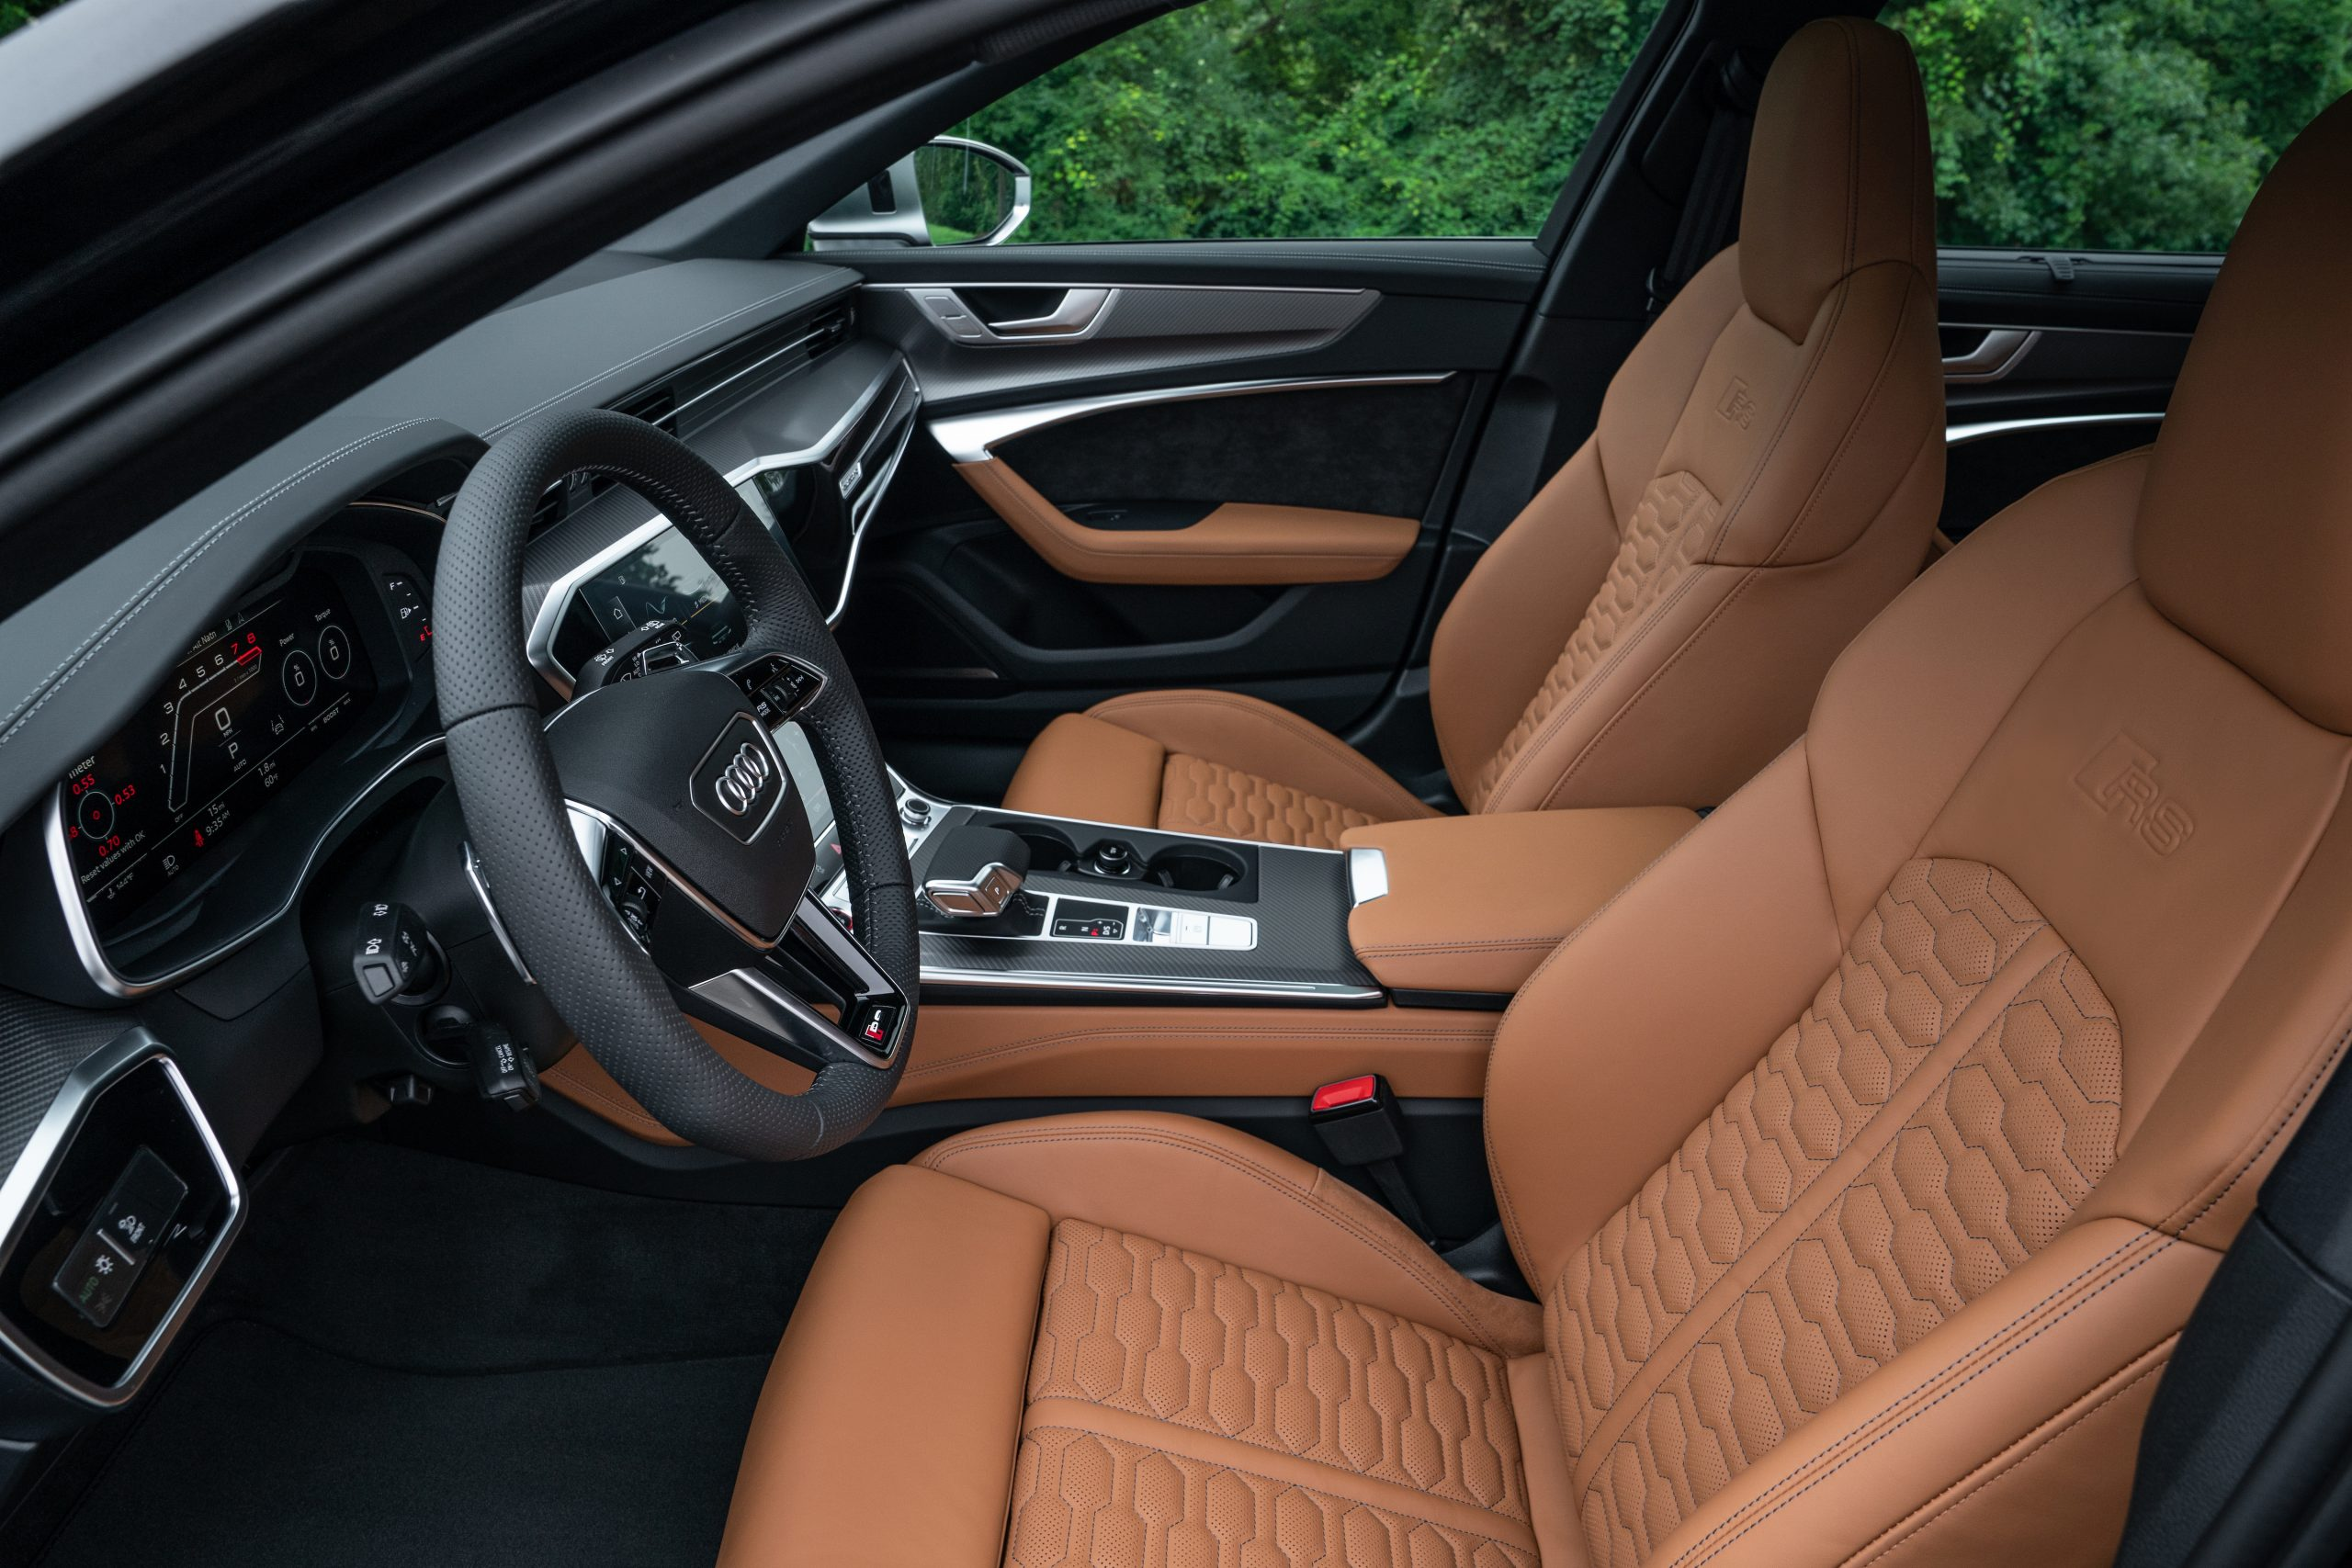 RS 6 Avant Nardo Gray interior front side profile